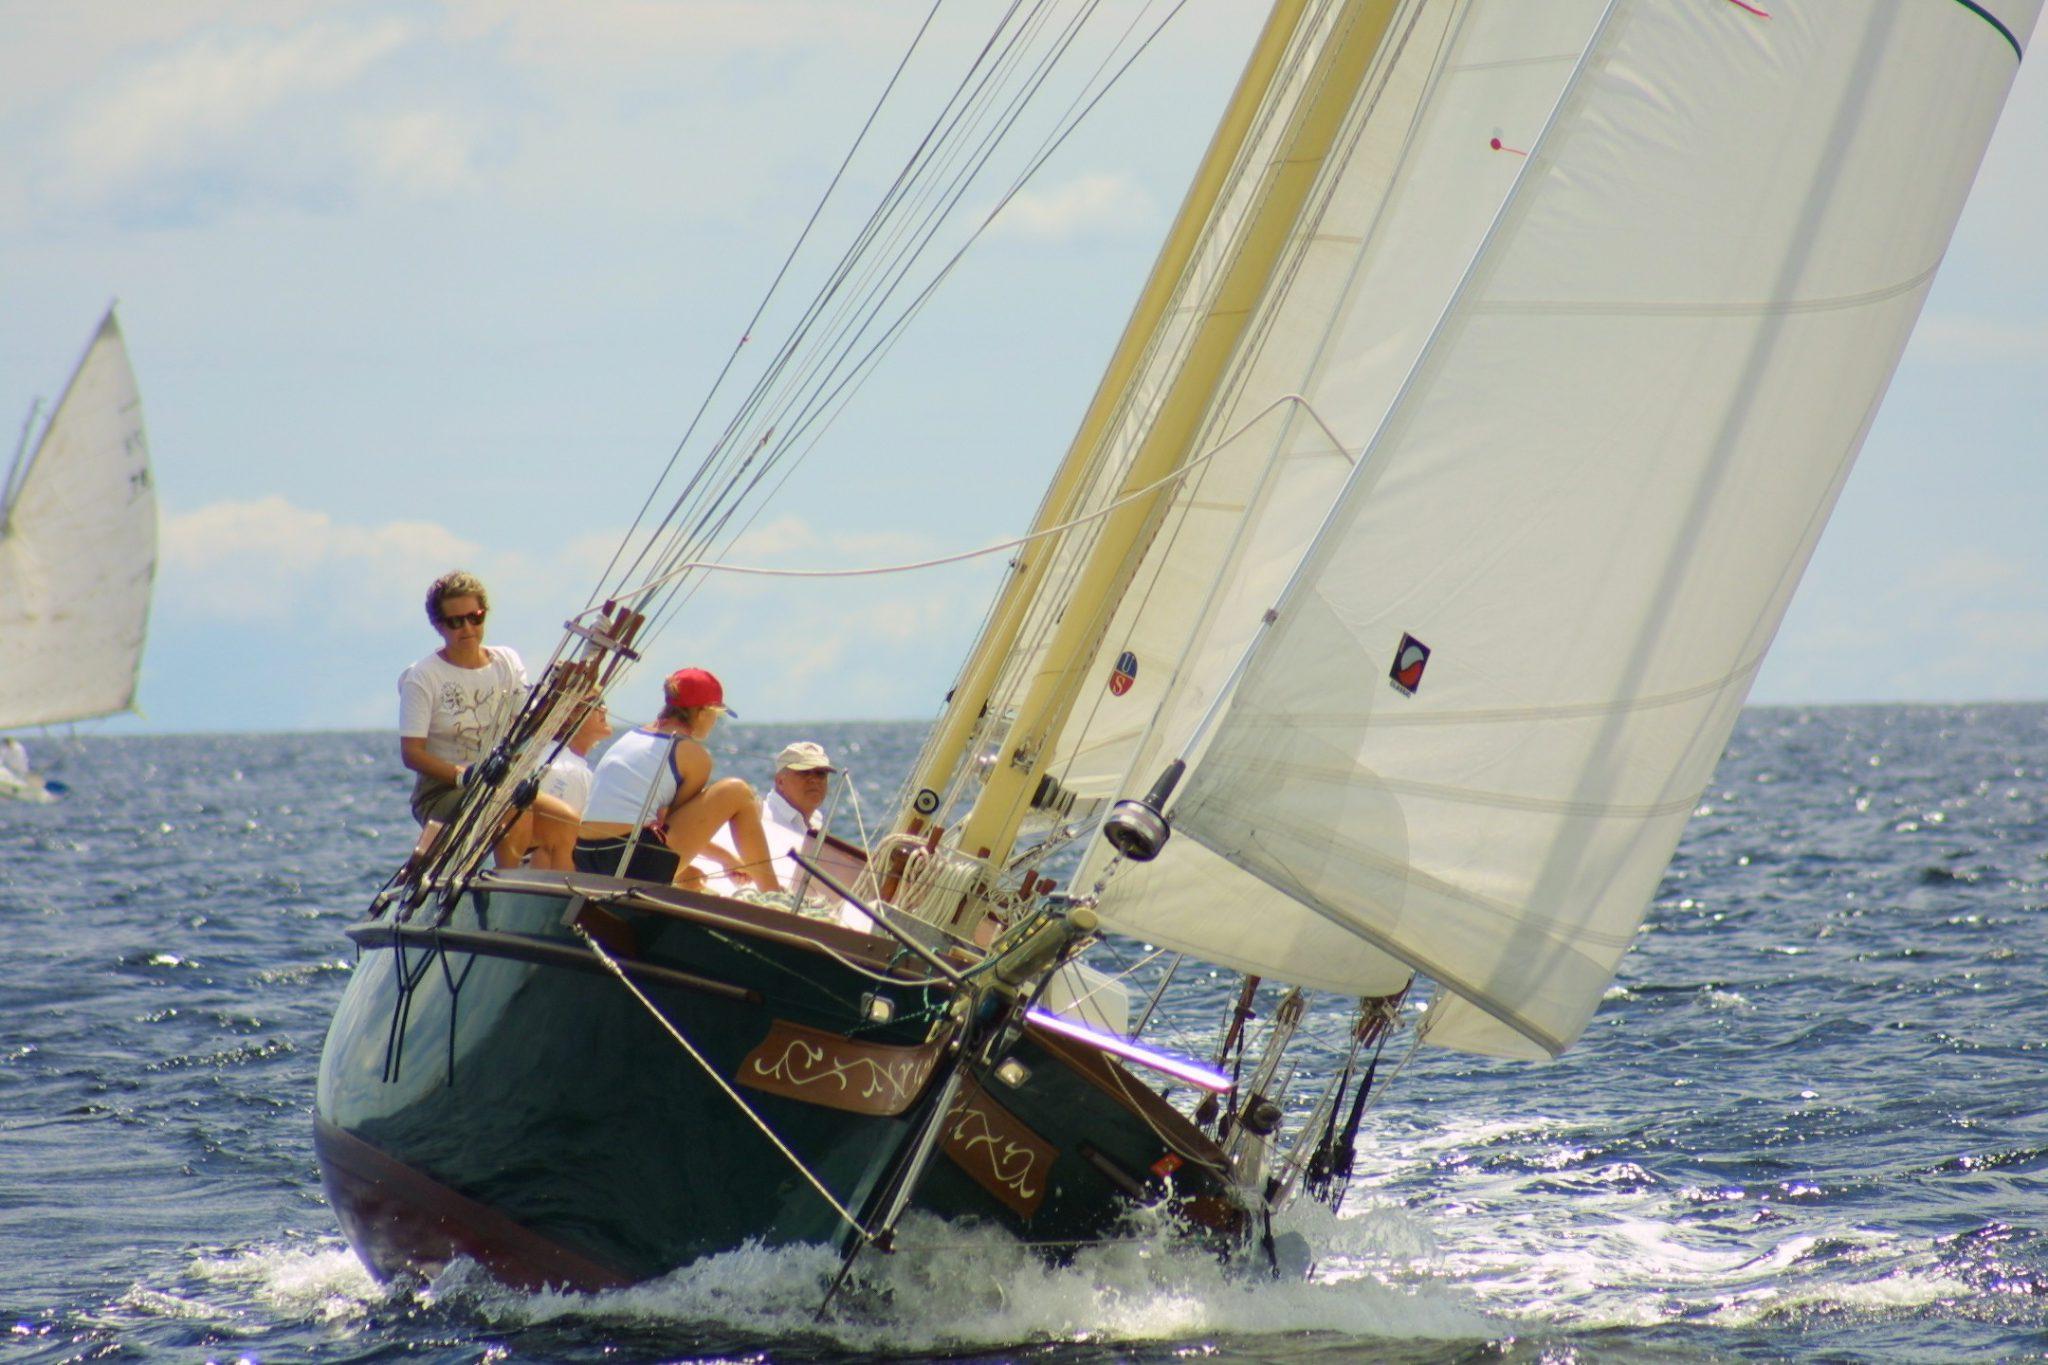 Morgana under sail on a sunny day